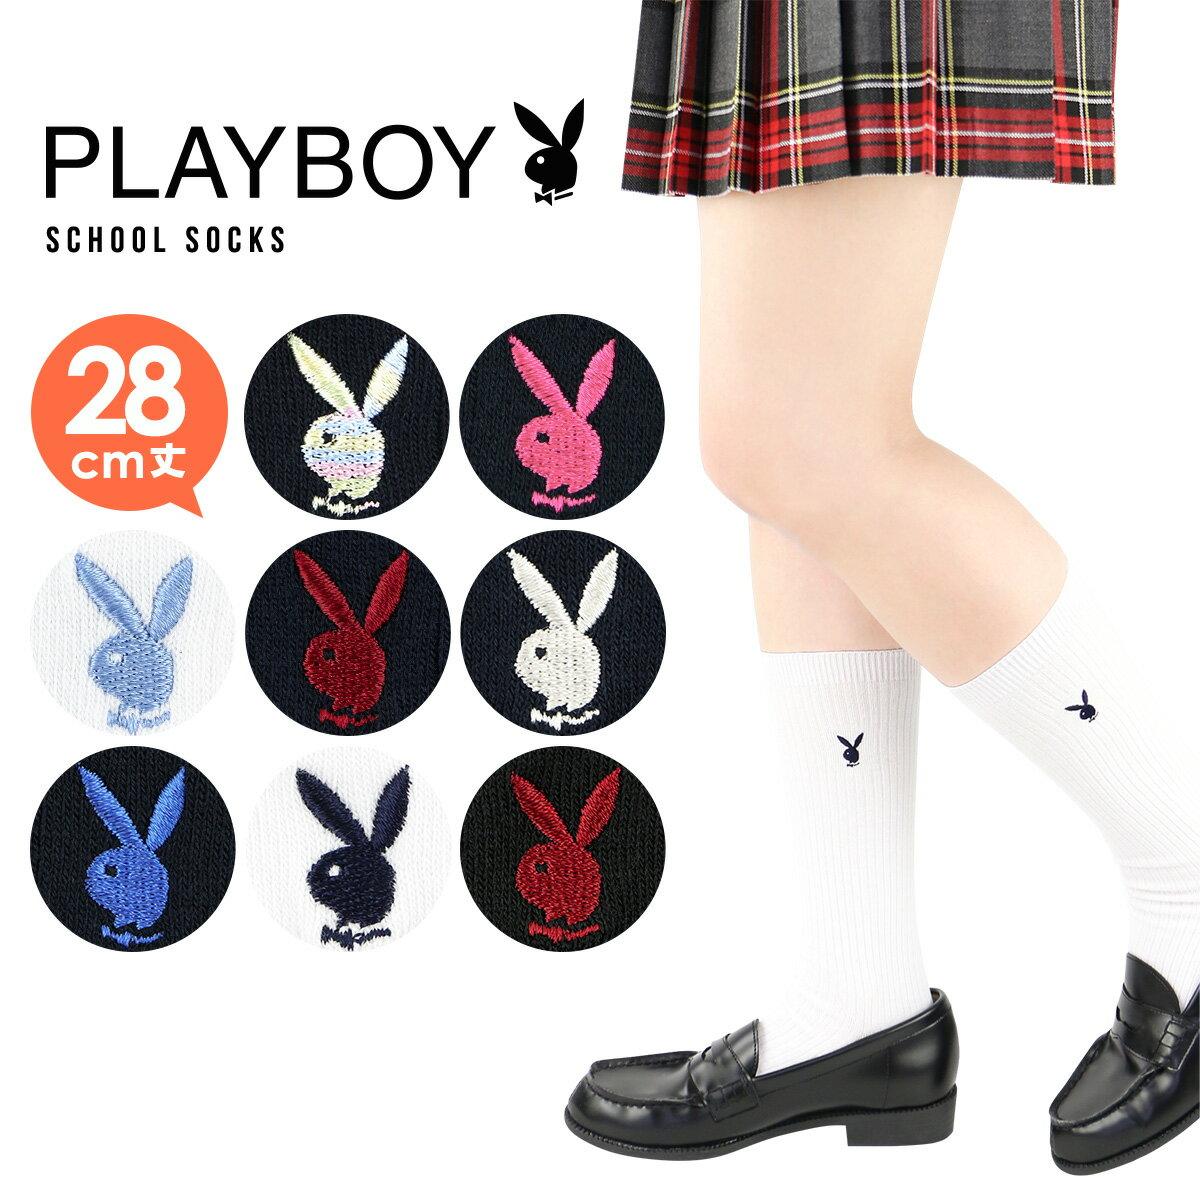 PLAYBOY (プレイボーイ) スクールソックス ワンポイント 両面刺繍 28cm丈 レディス ハイソックス 靴下 3737-352ポイント10倍